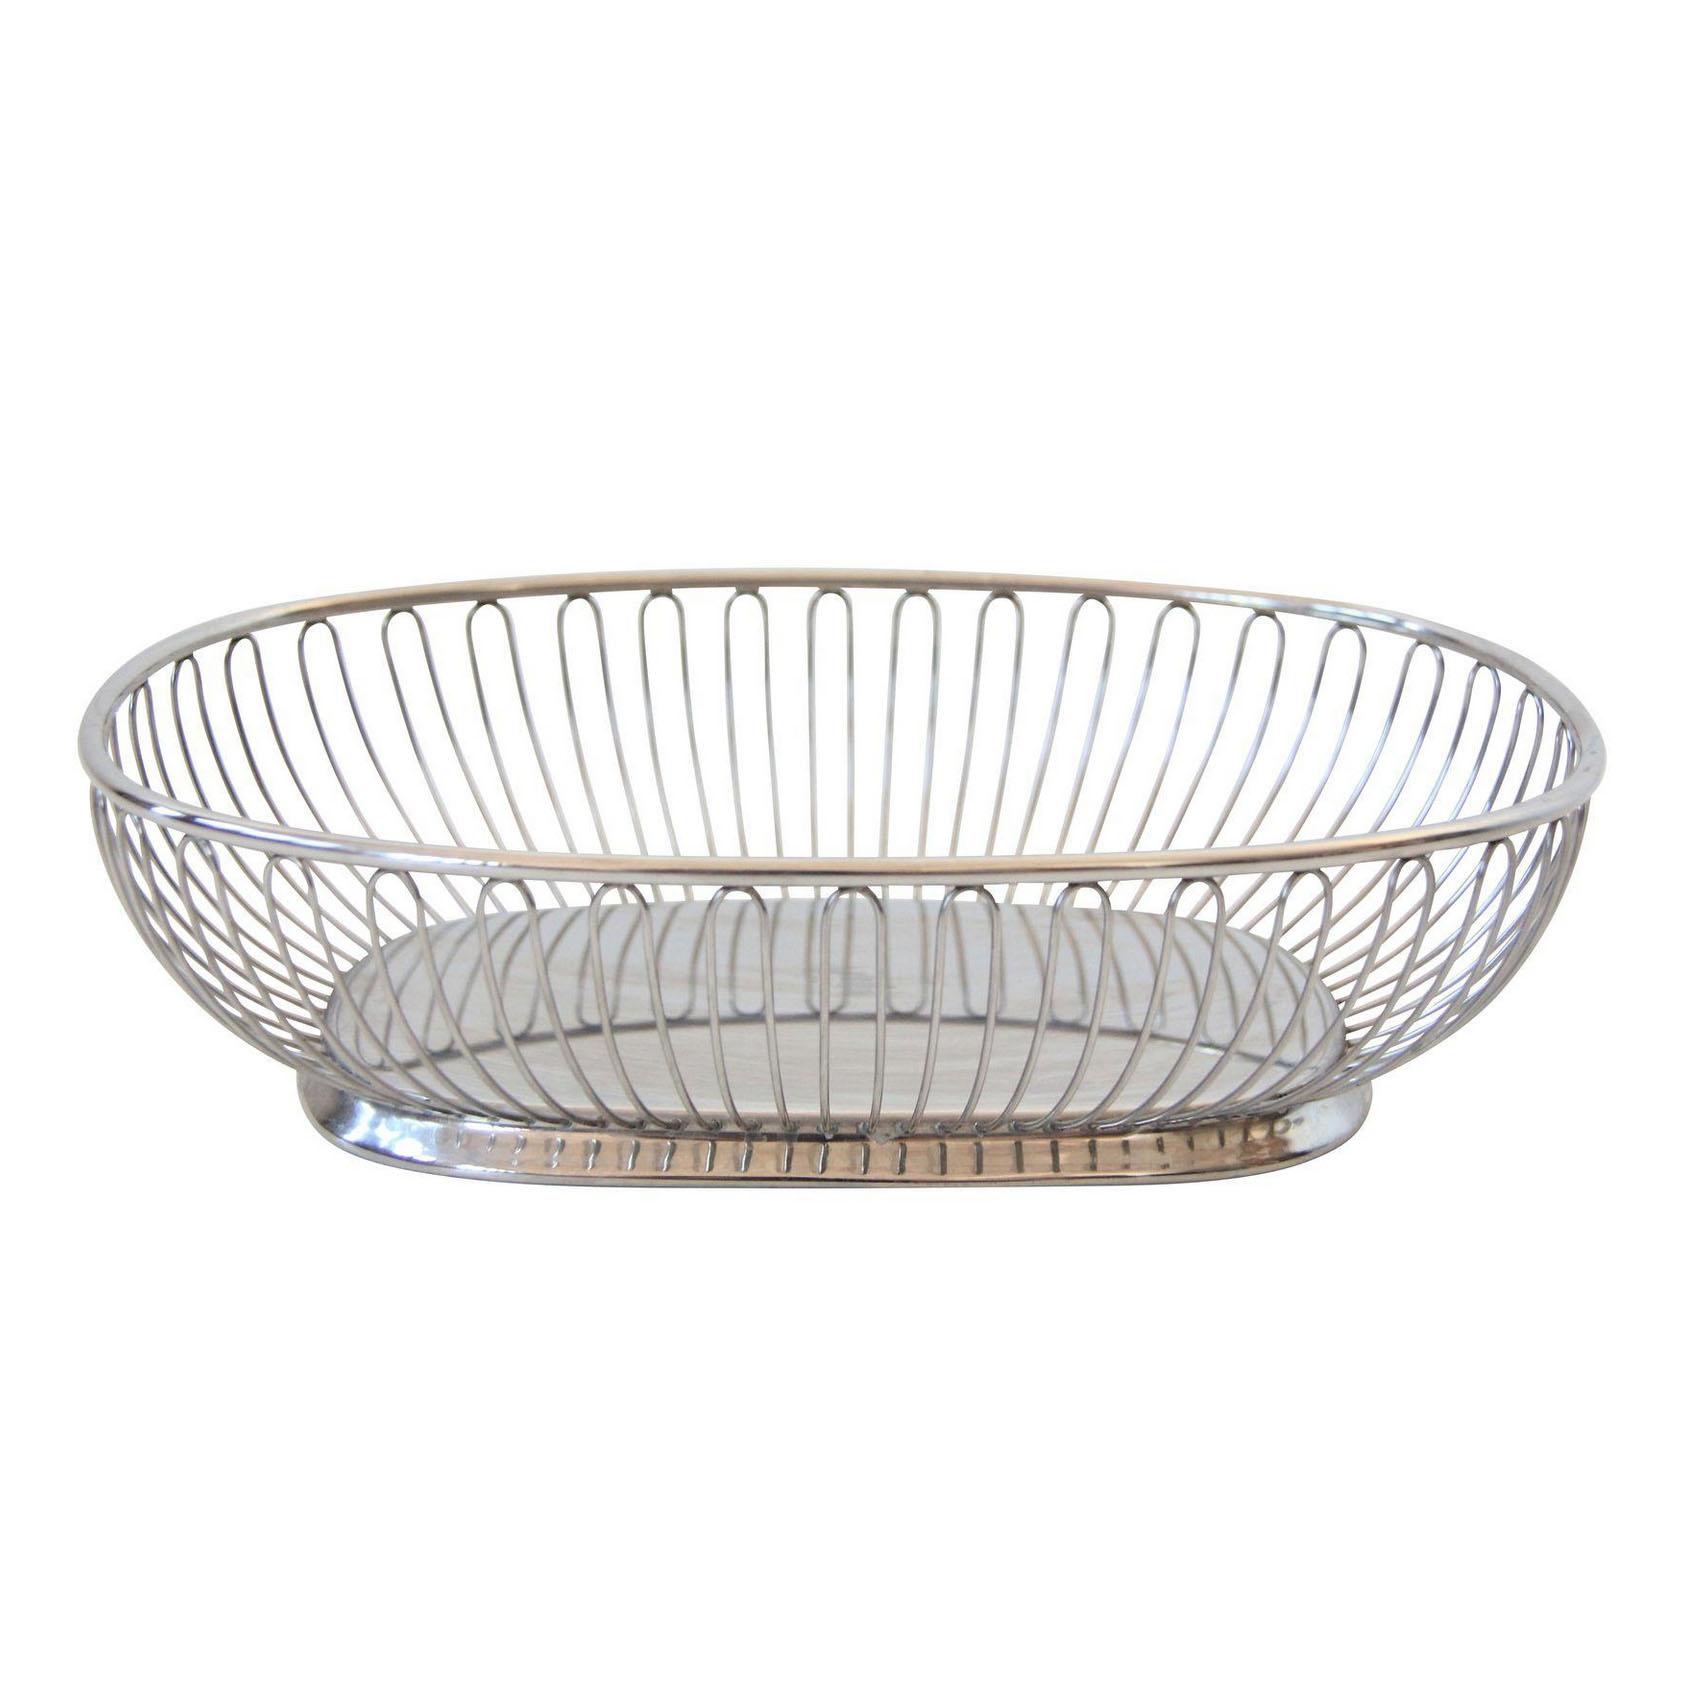 Vintage Mid Century Modern Chrome Wire Bowl